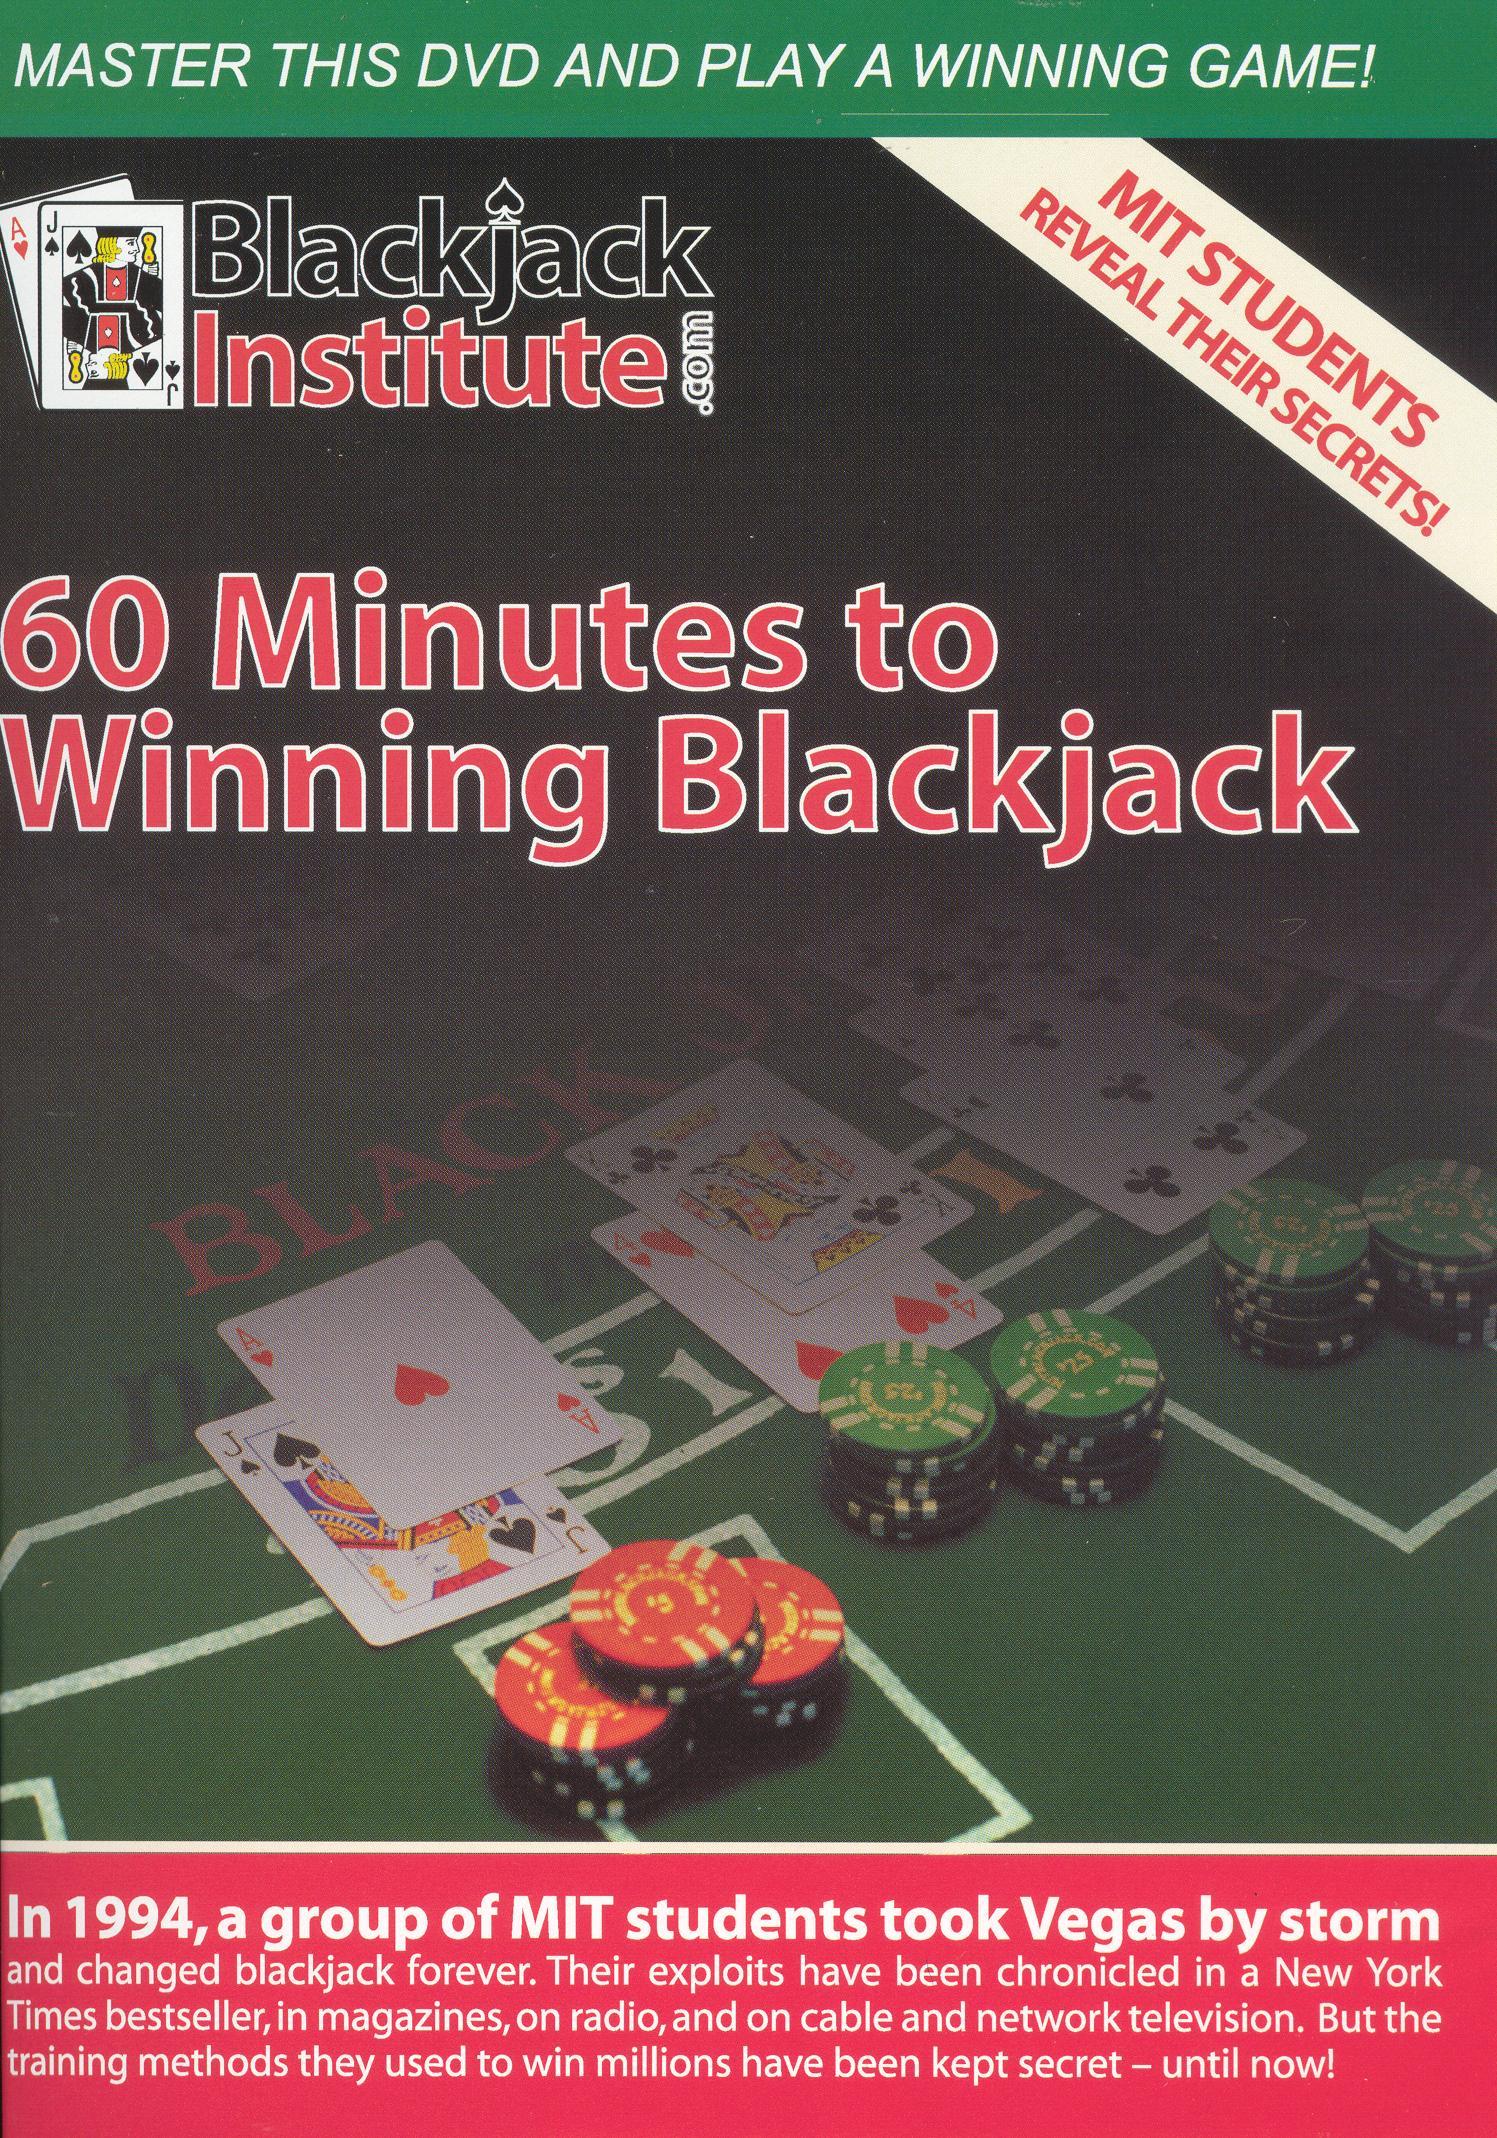 60 Minutes to Winning Blackjack